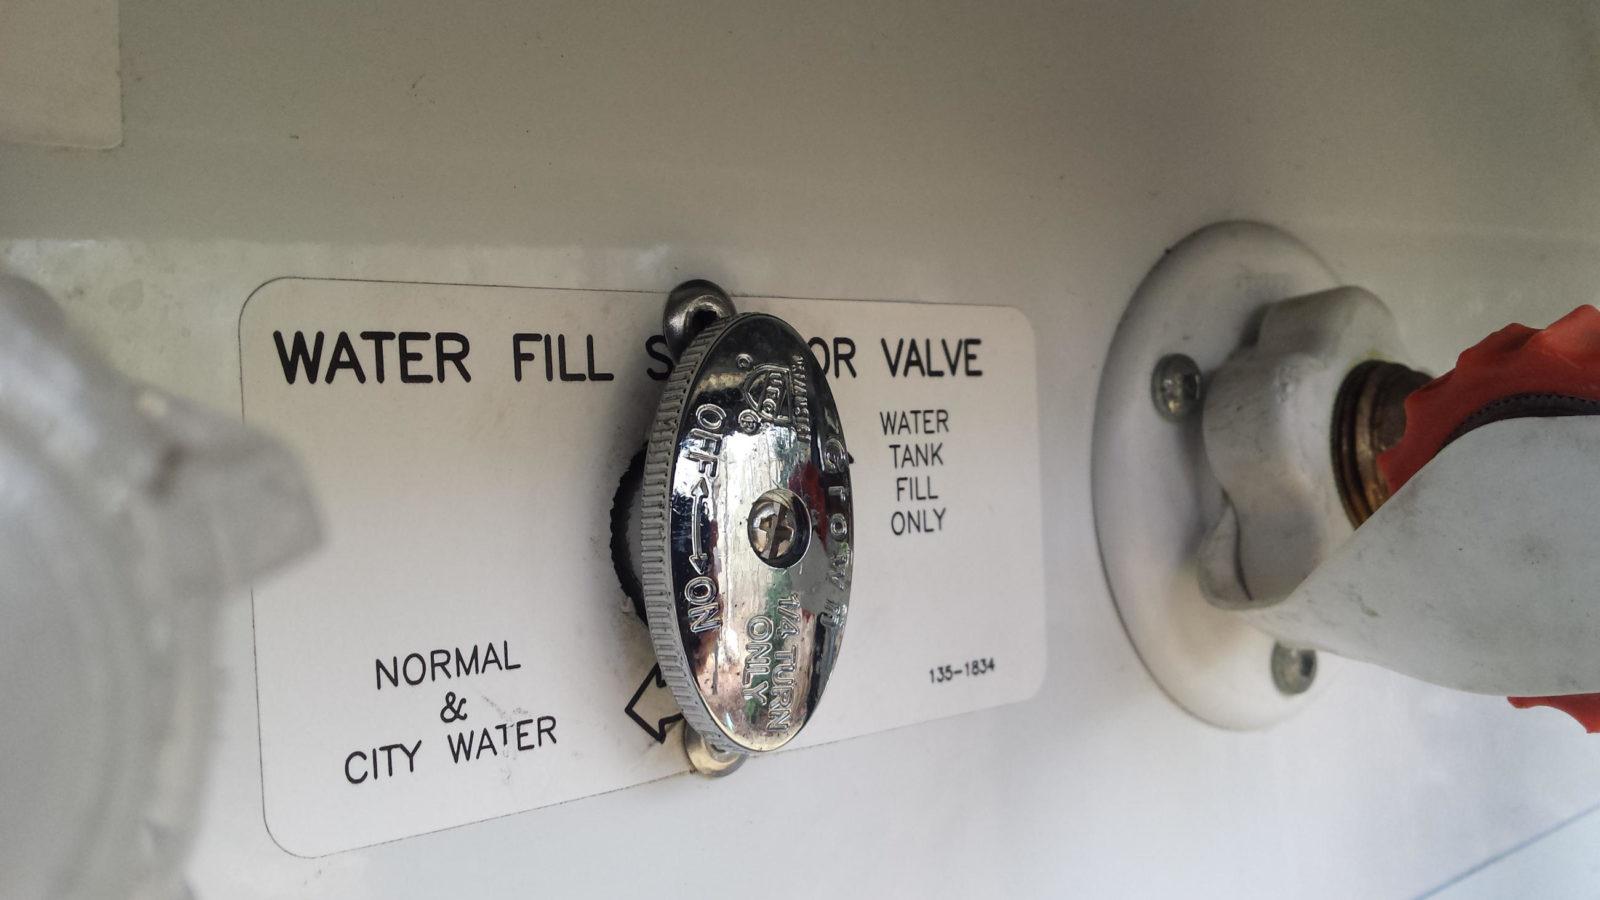 RV water tank fill switch